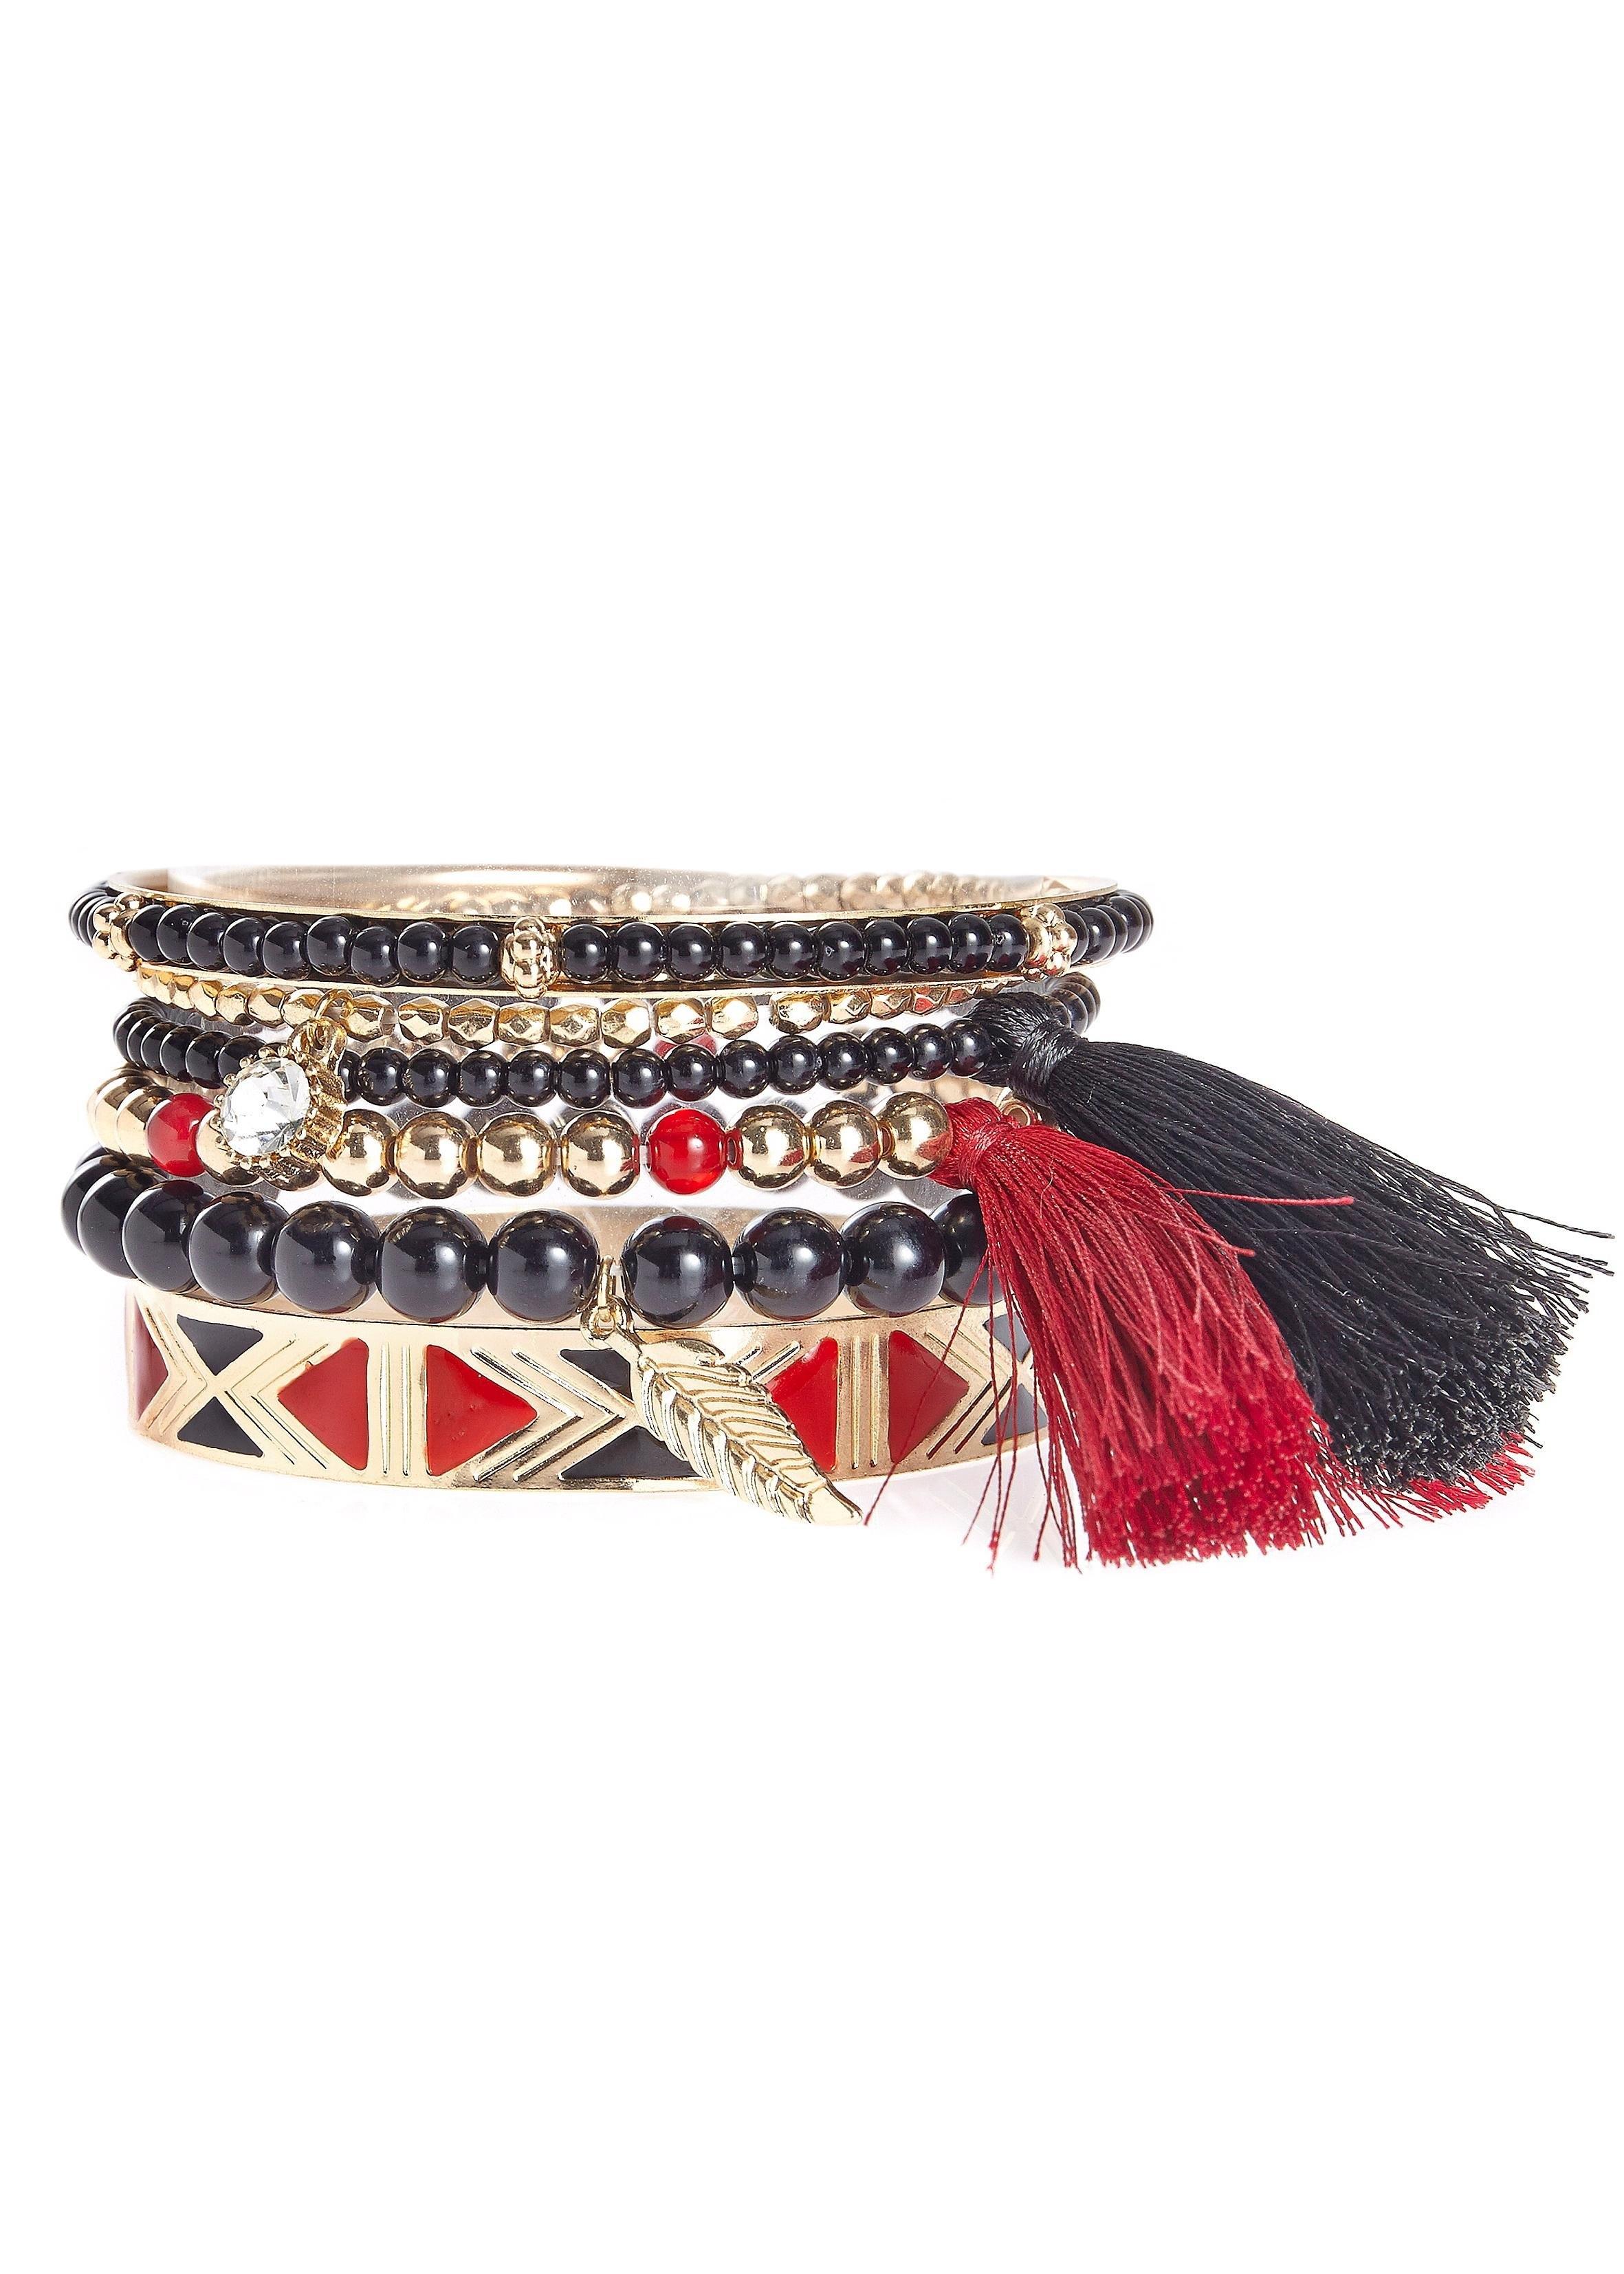 LASCANA armbandenset (6-delig) in de webshop van Lascana kopen